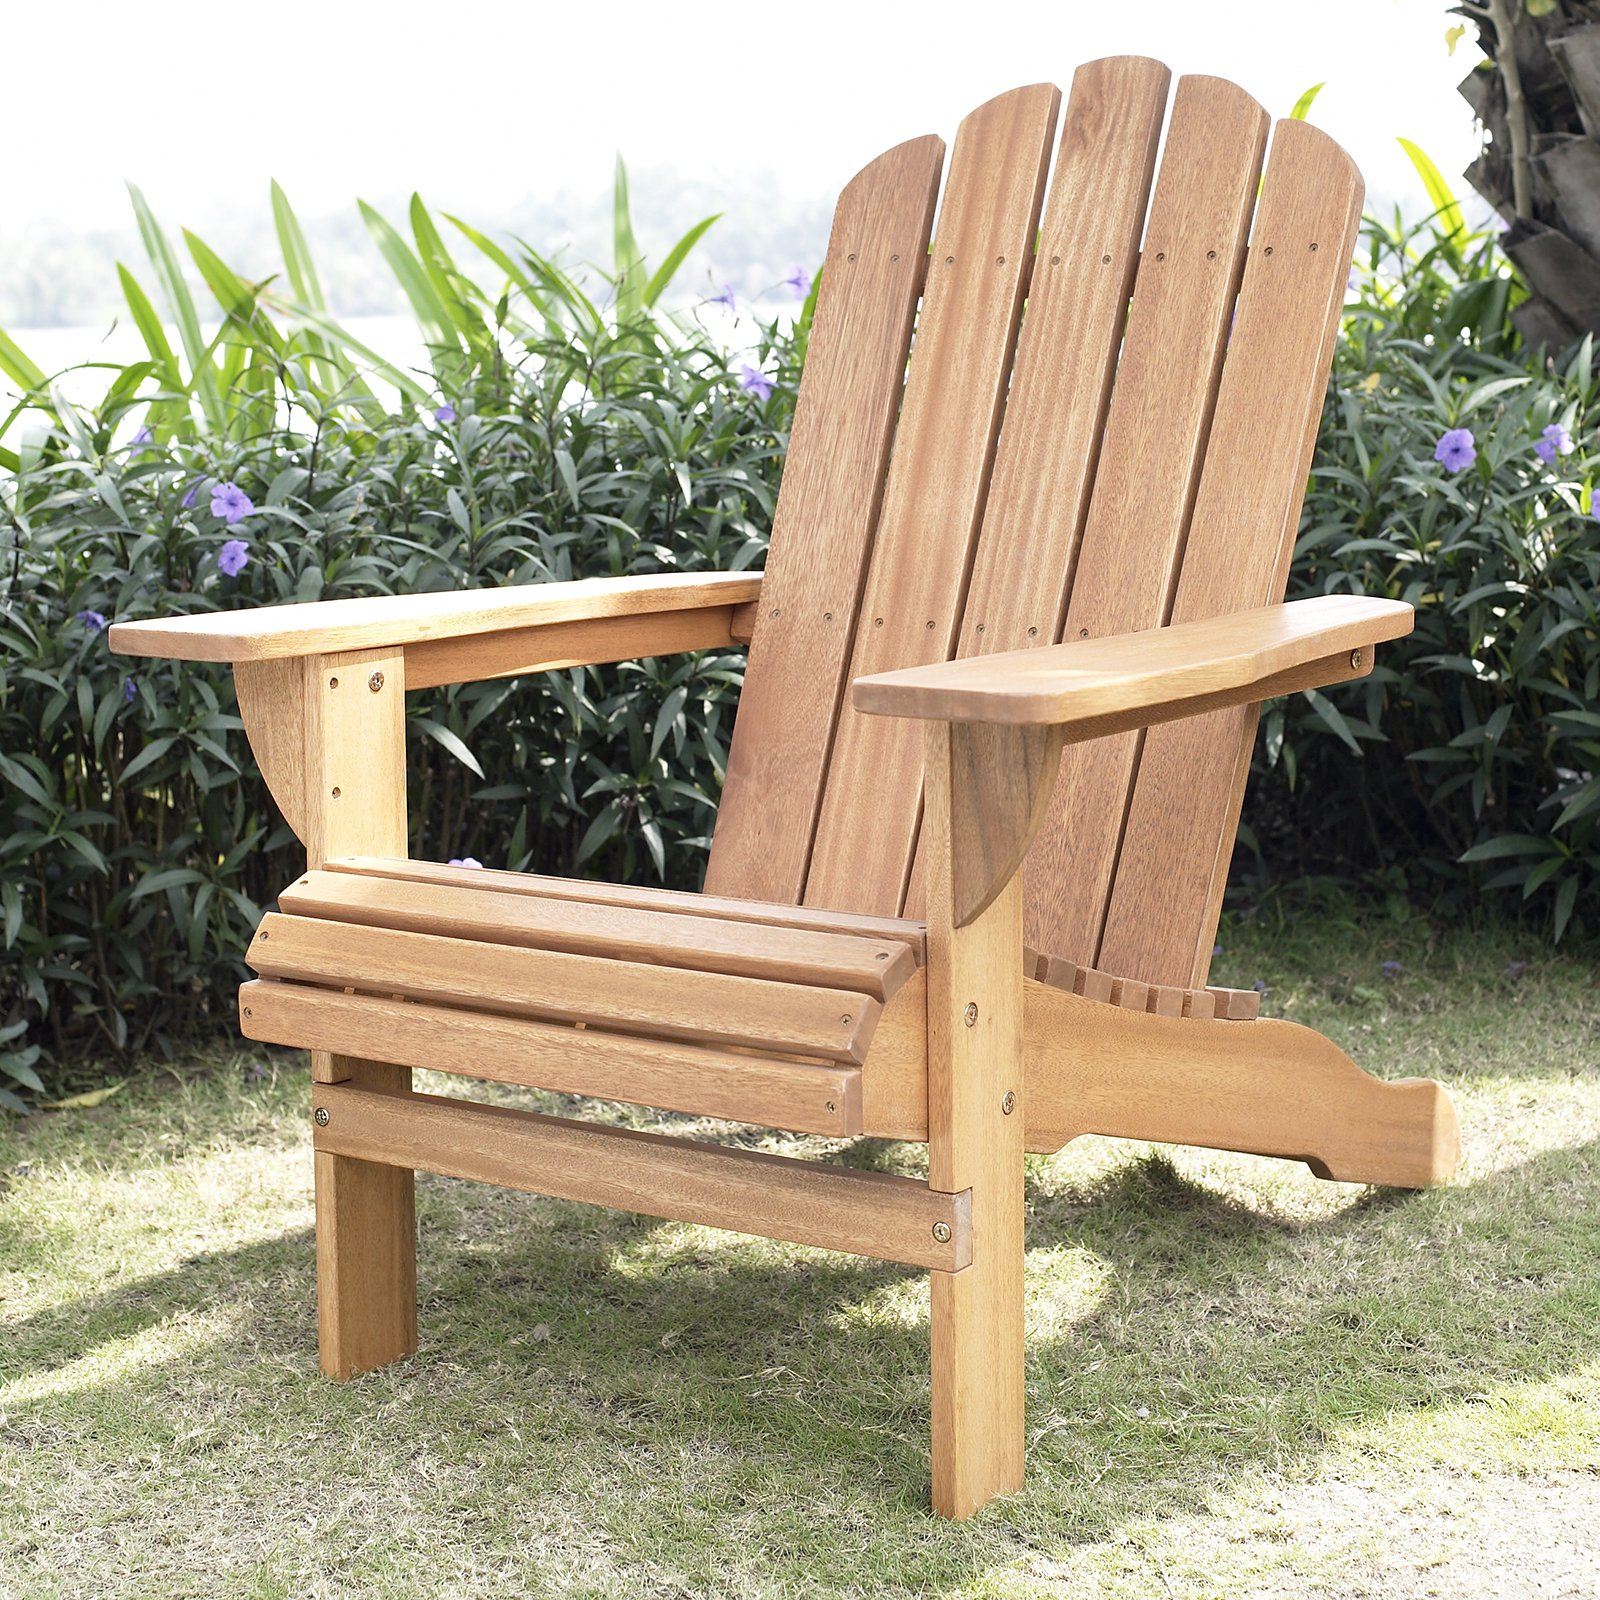 Belham Living Shoreline Adirondack Chair - natural - walmart.com XAJHAWC